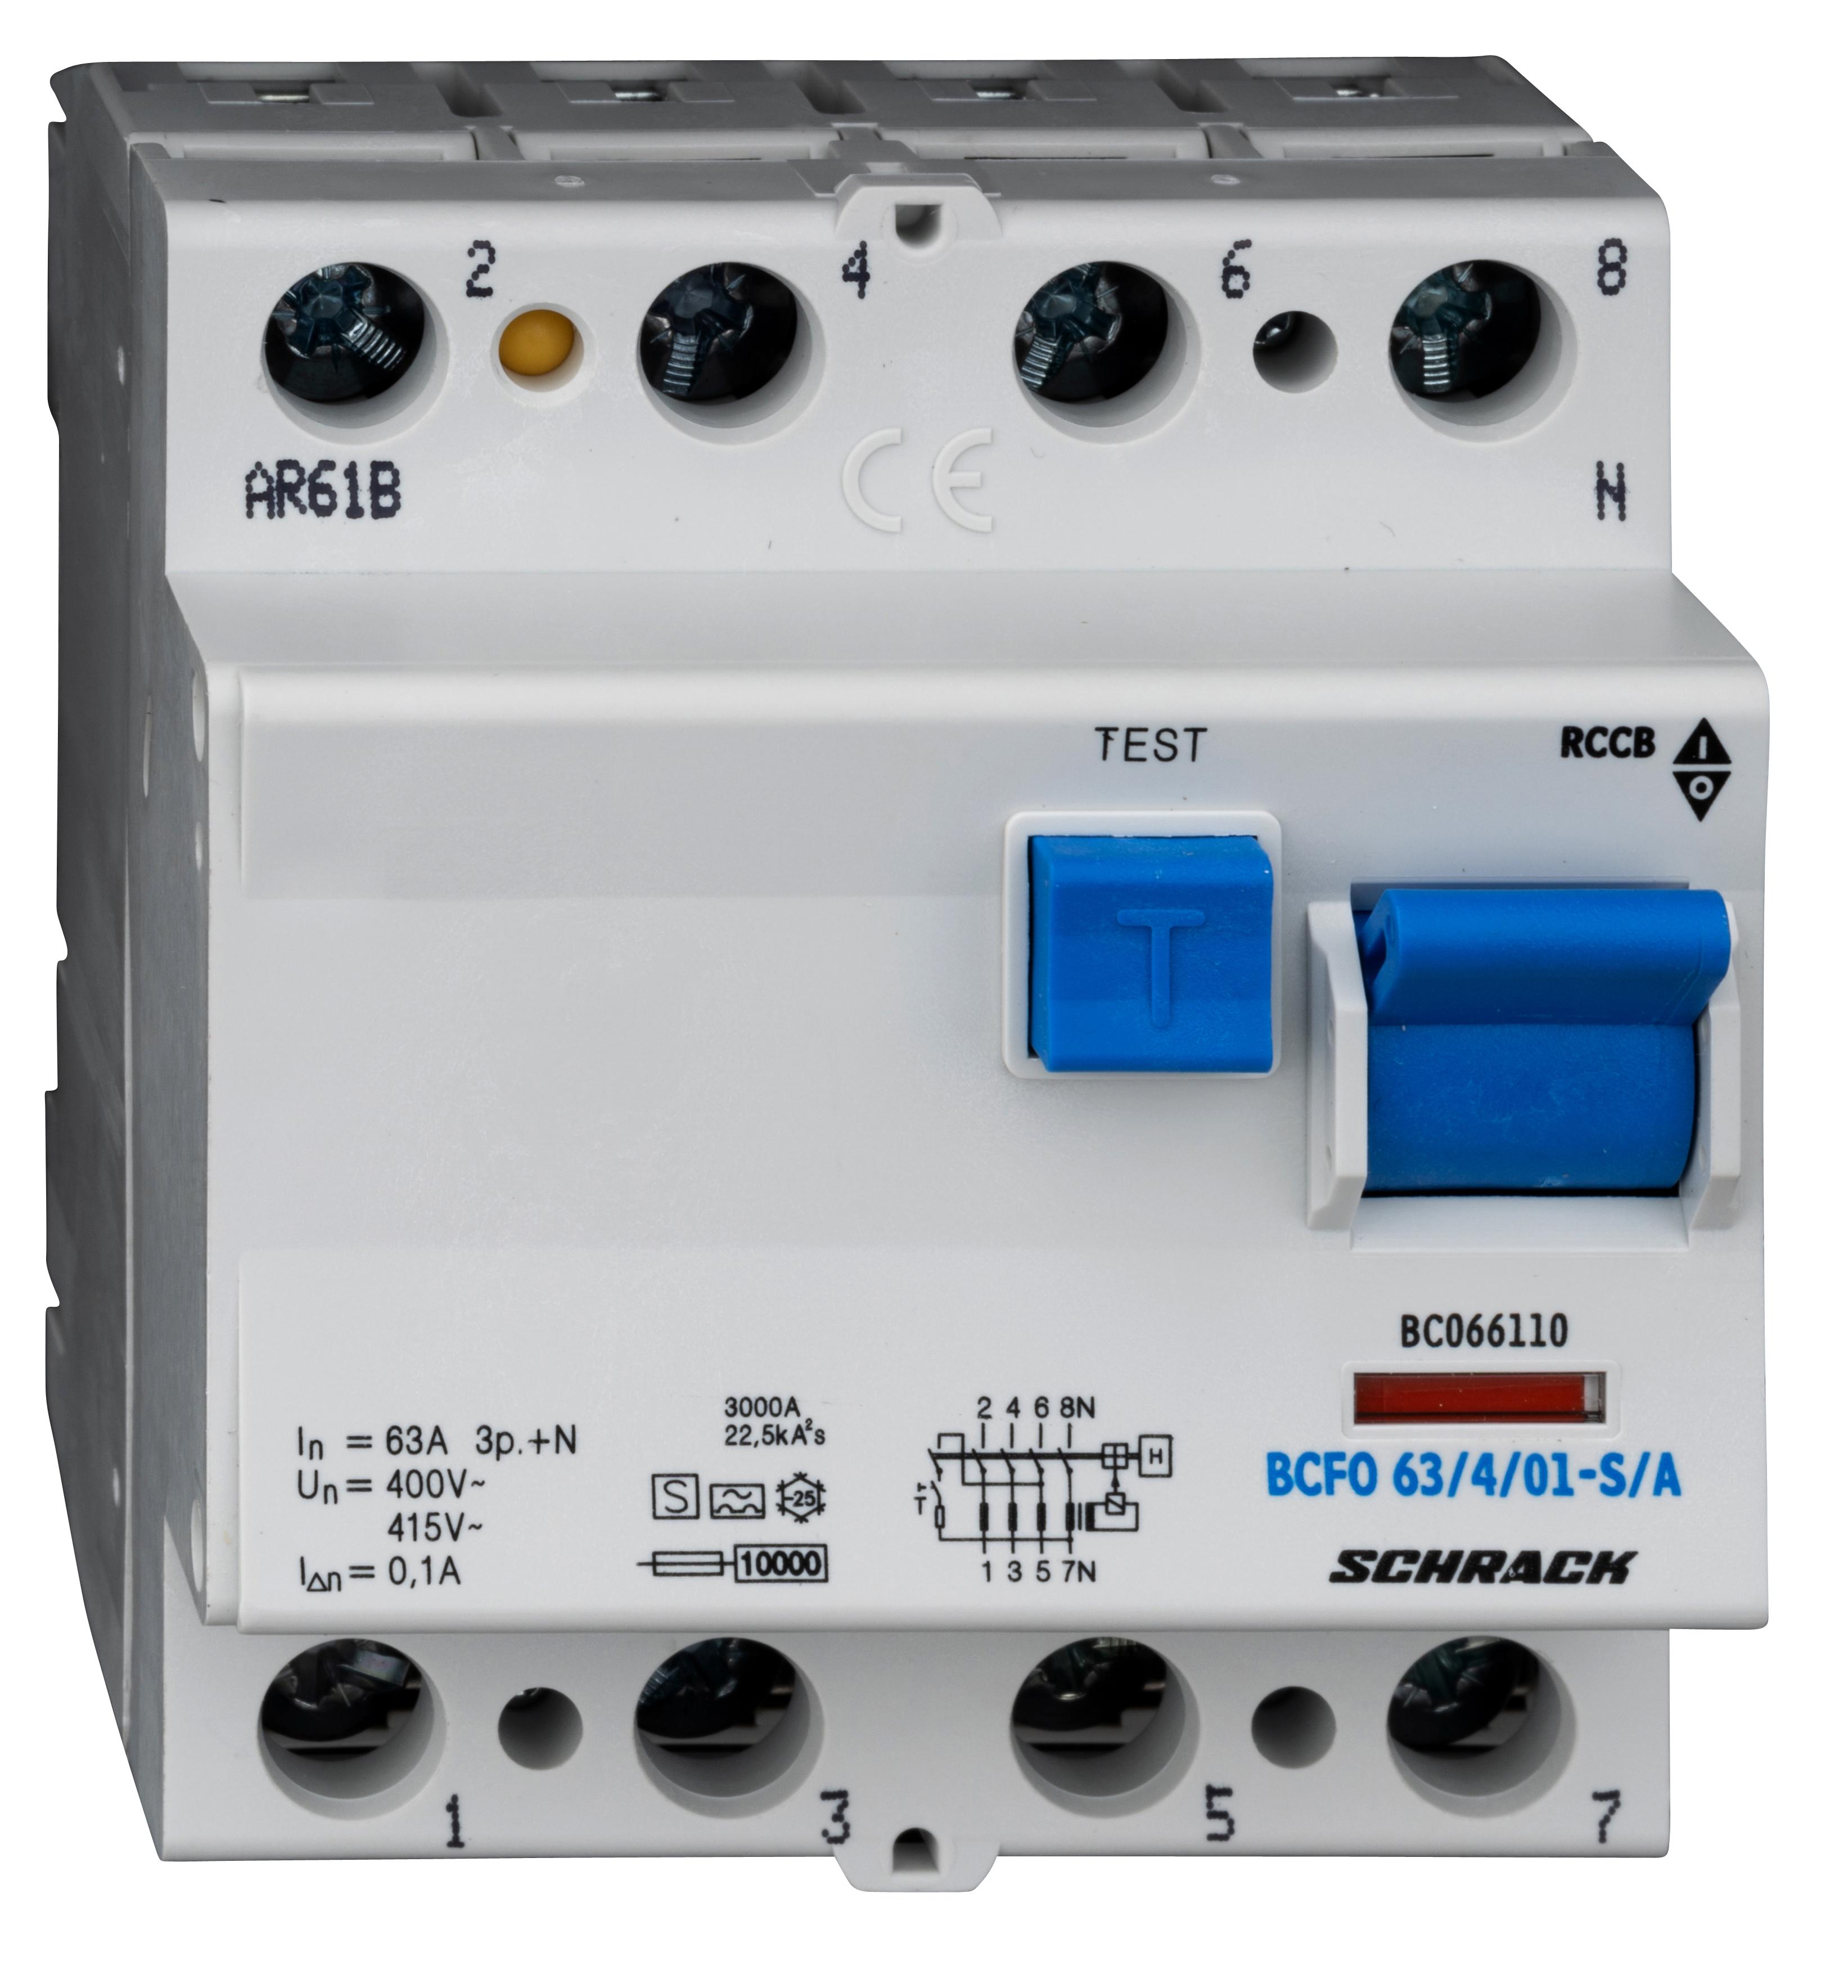 1 Stk FI-Schalter, 63A, 4-polig, 100mA, Bauart S, Typ A (Puls) BC066110--